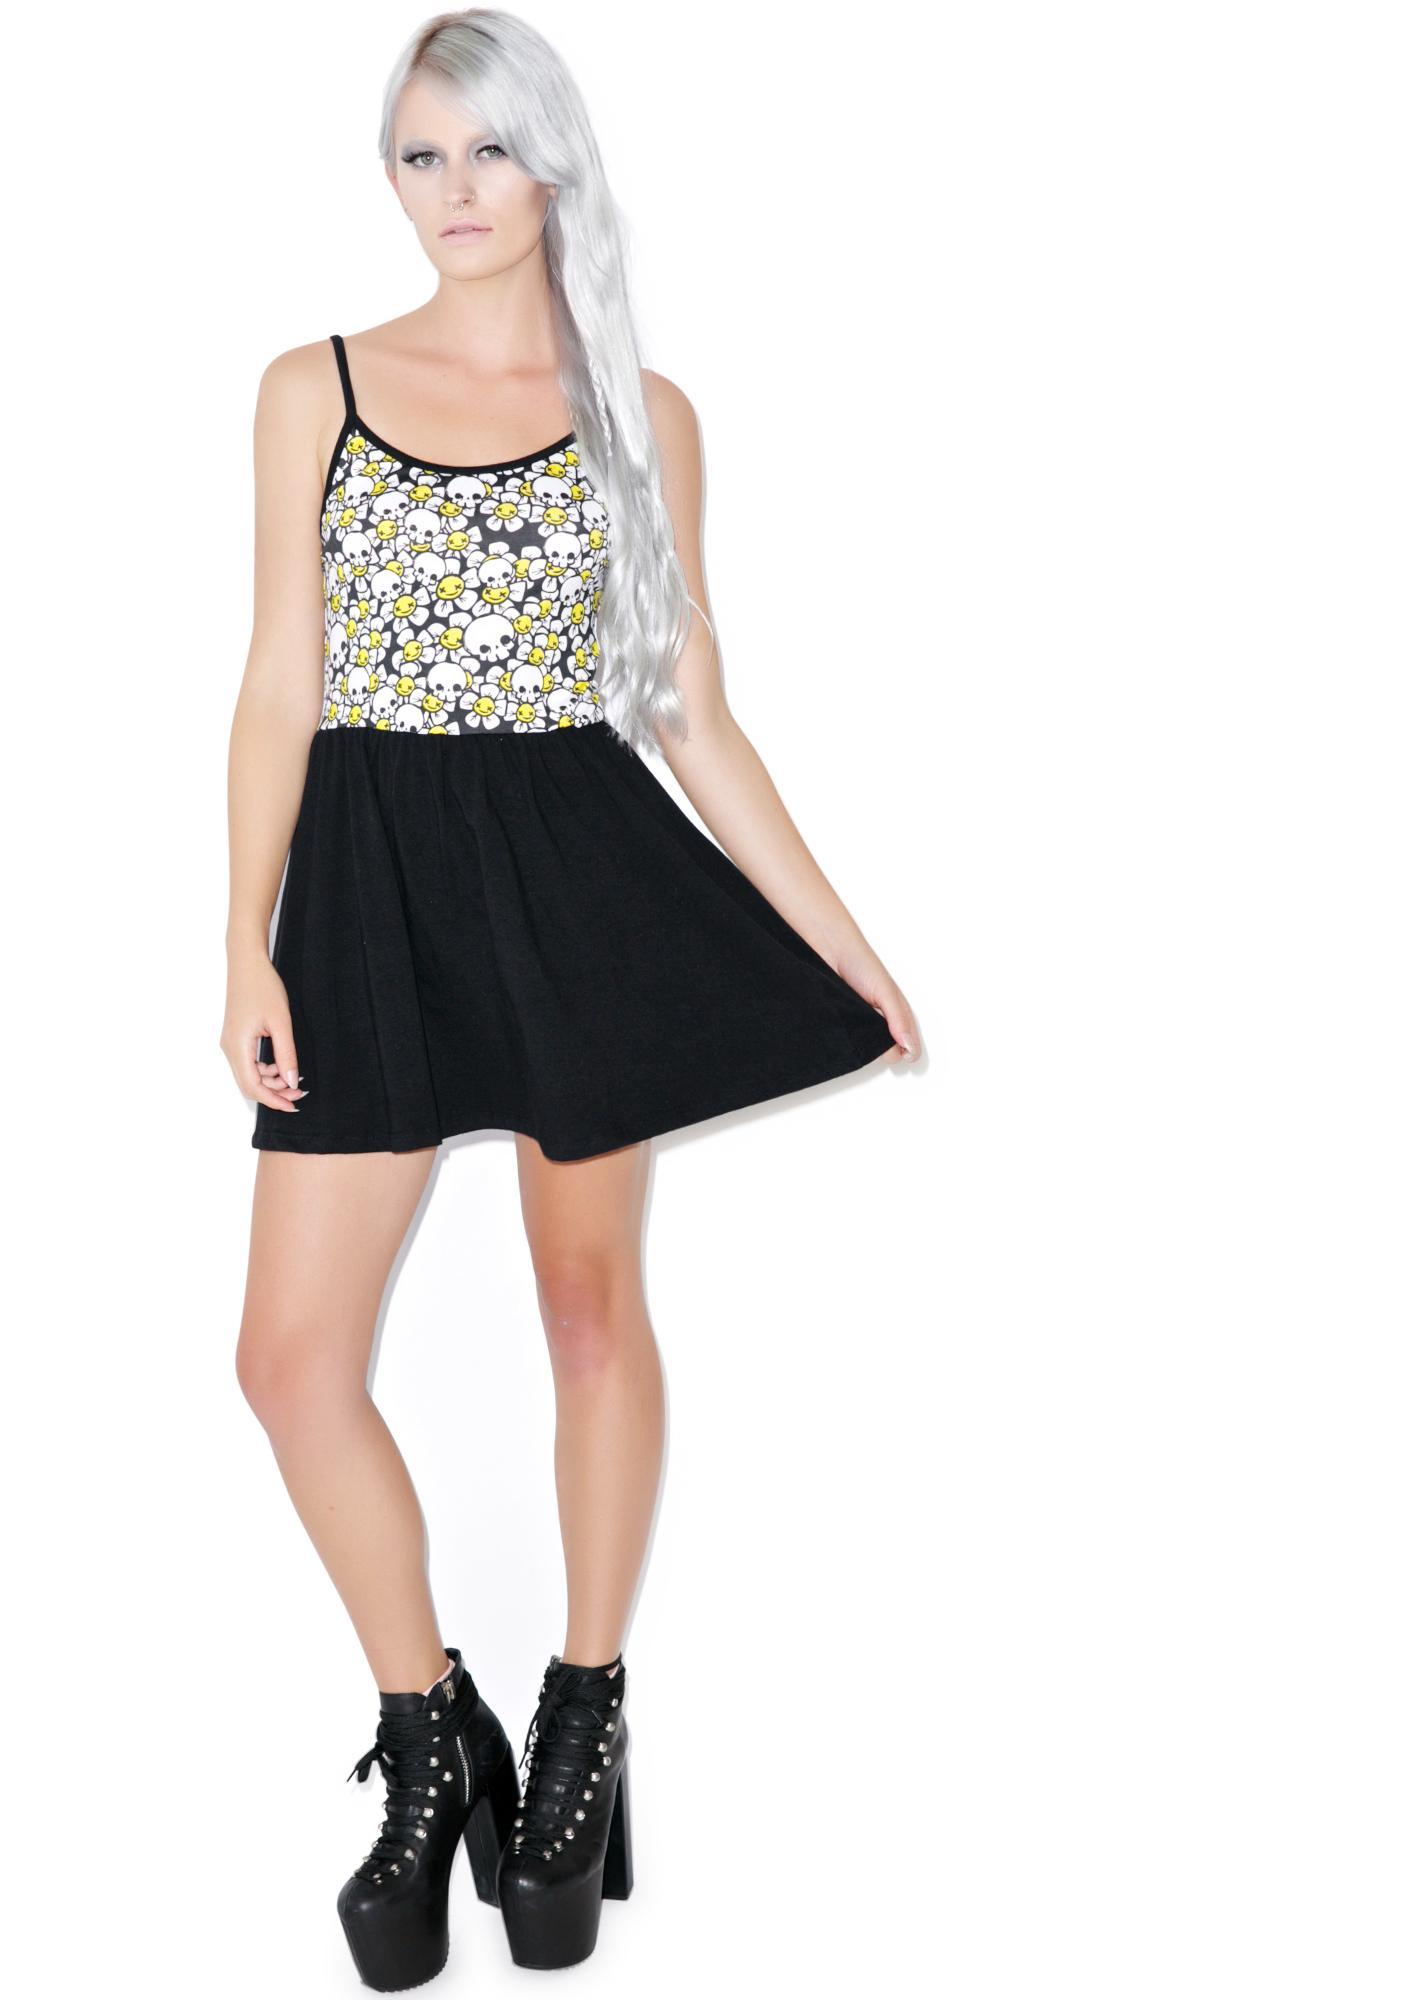 Dead Daisy Ballerina Dress